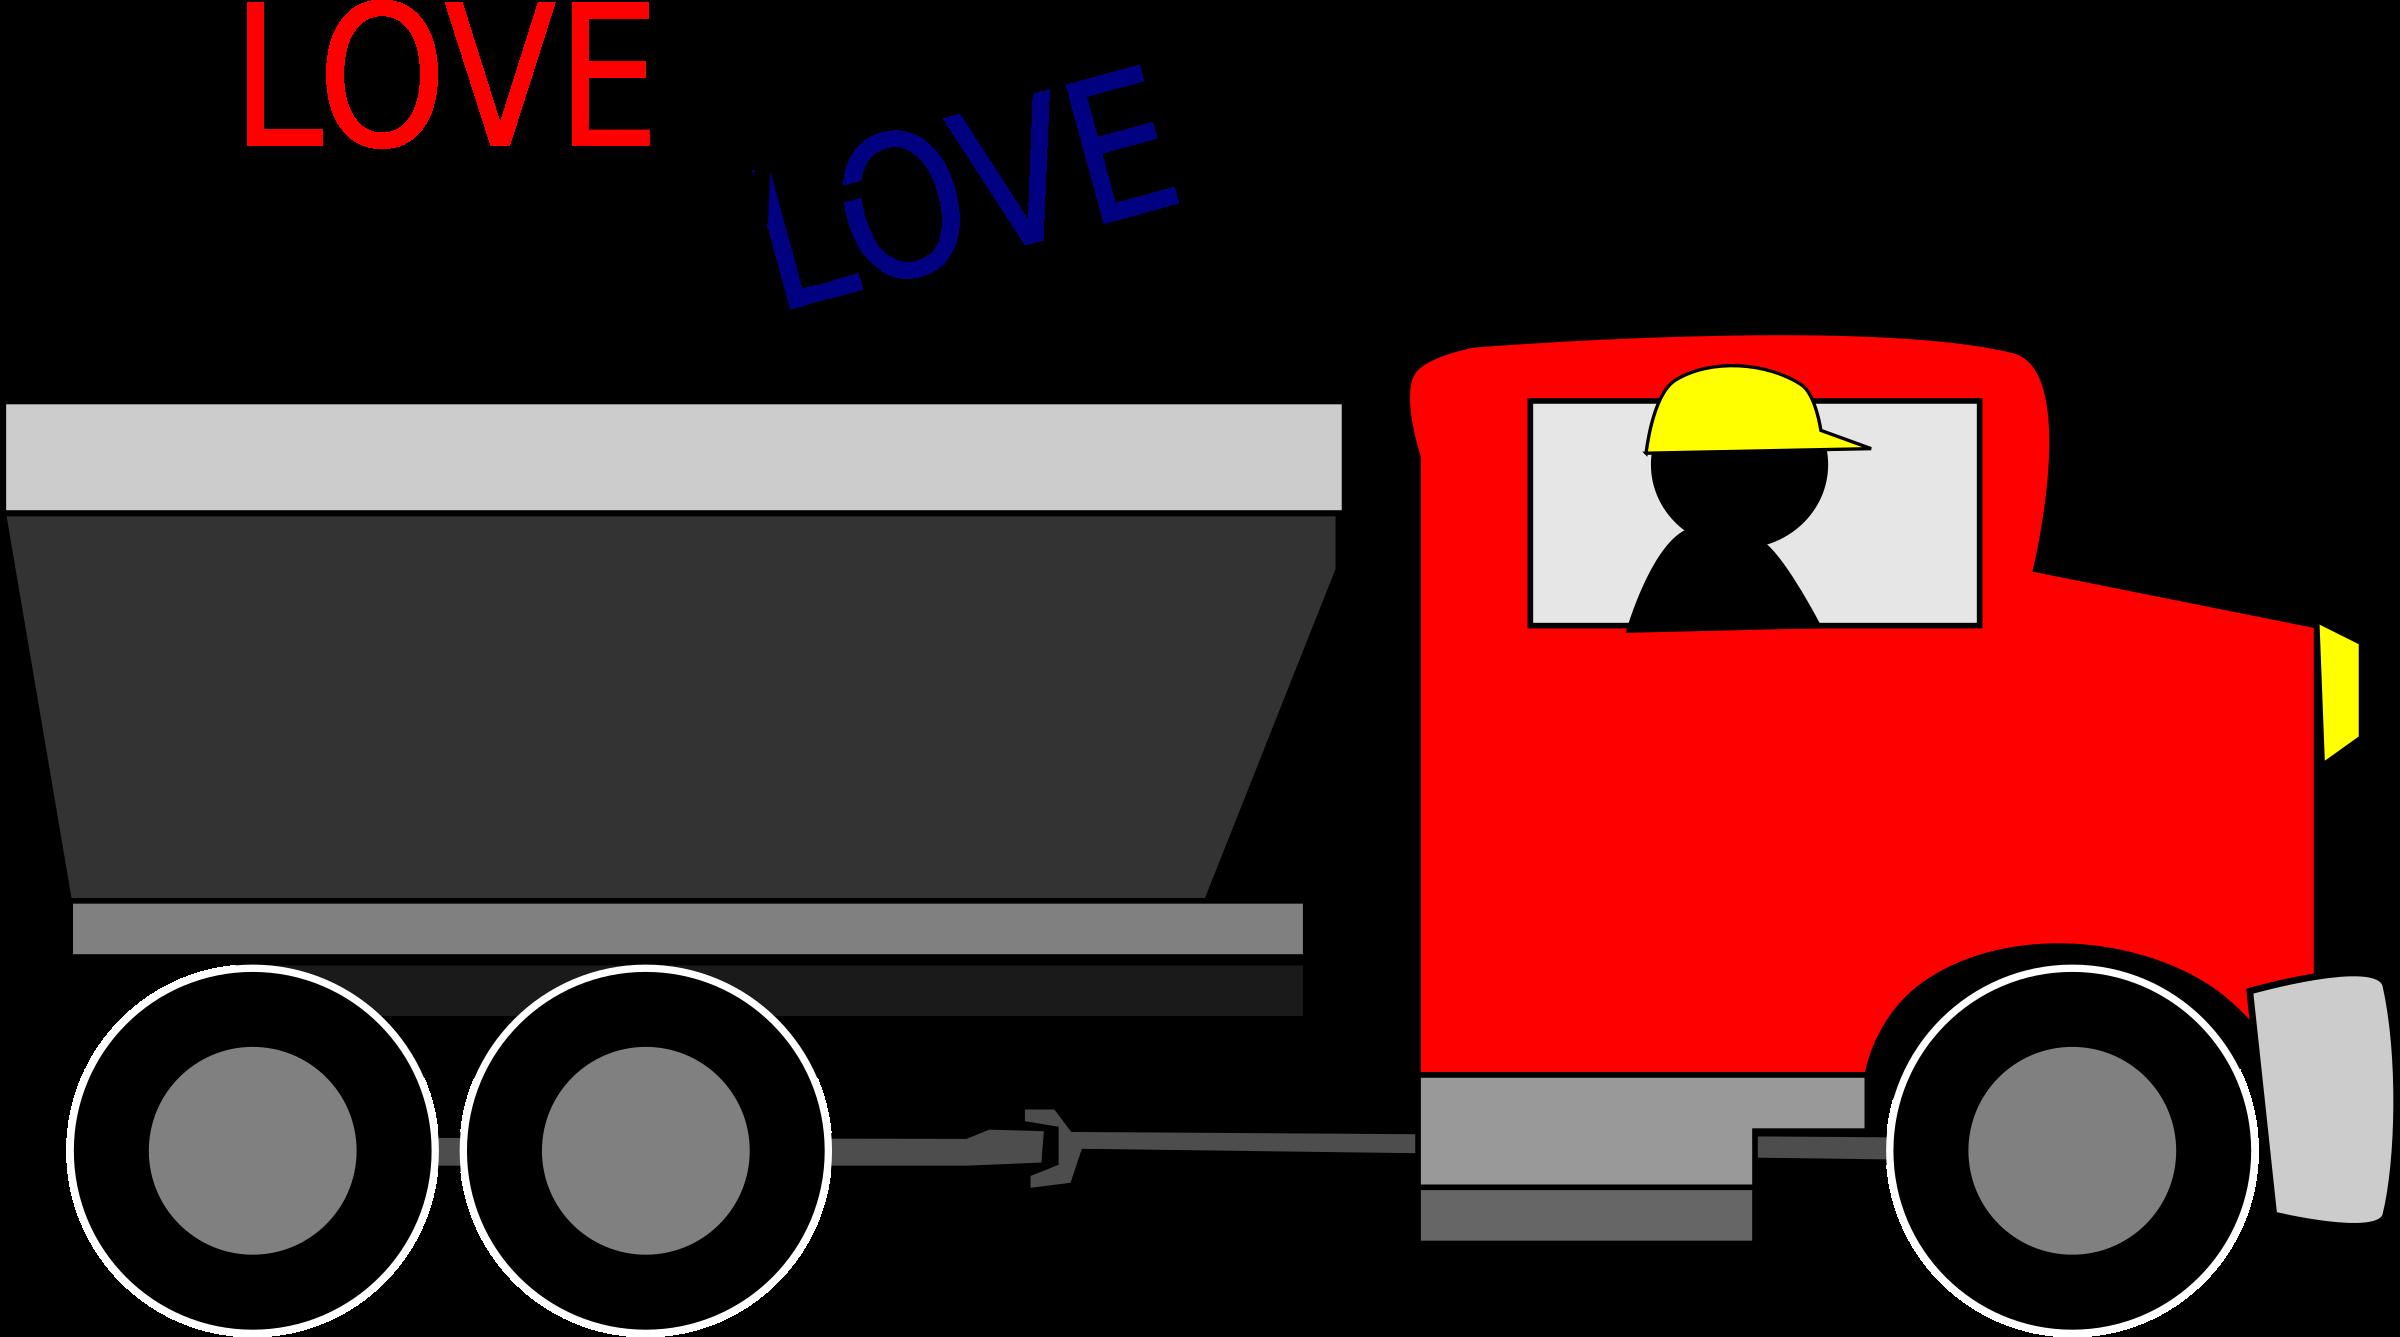 Car love clipart transparent download Clipart - Loads of Love transparent download